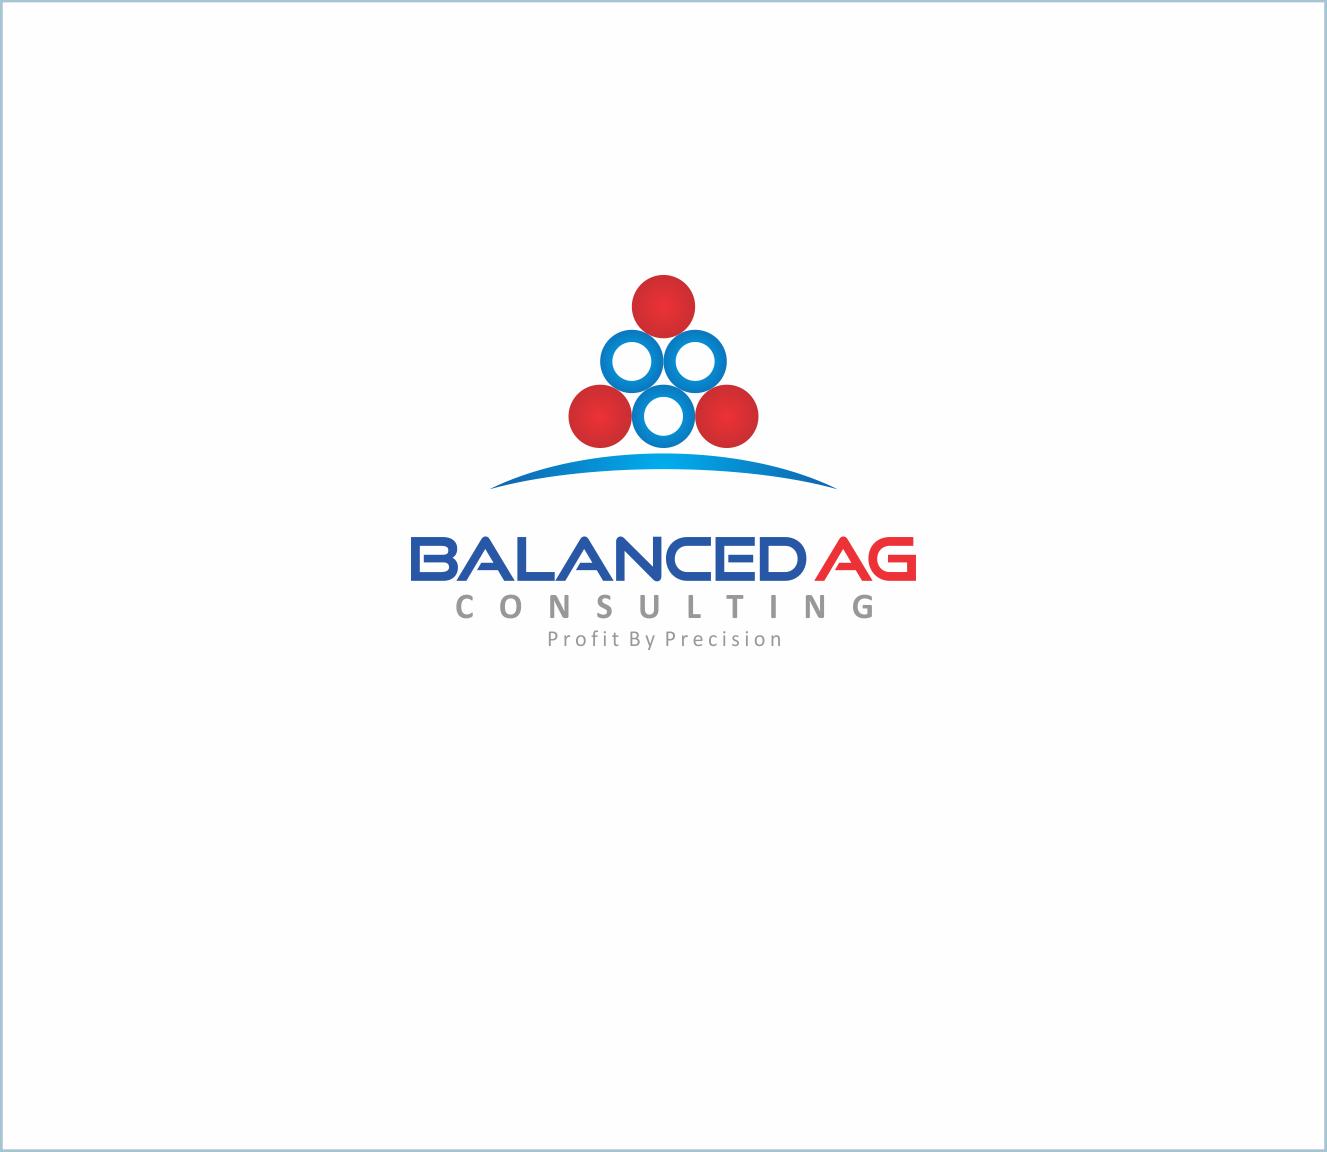 Logo Design by Armada Jamaluddin - Entry No. 46 in the Logo Design Contest Captivating Logo Design for Balanced Ag Consulting.